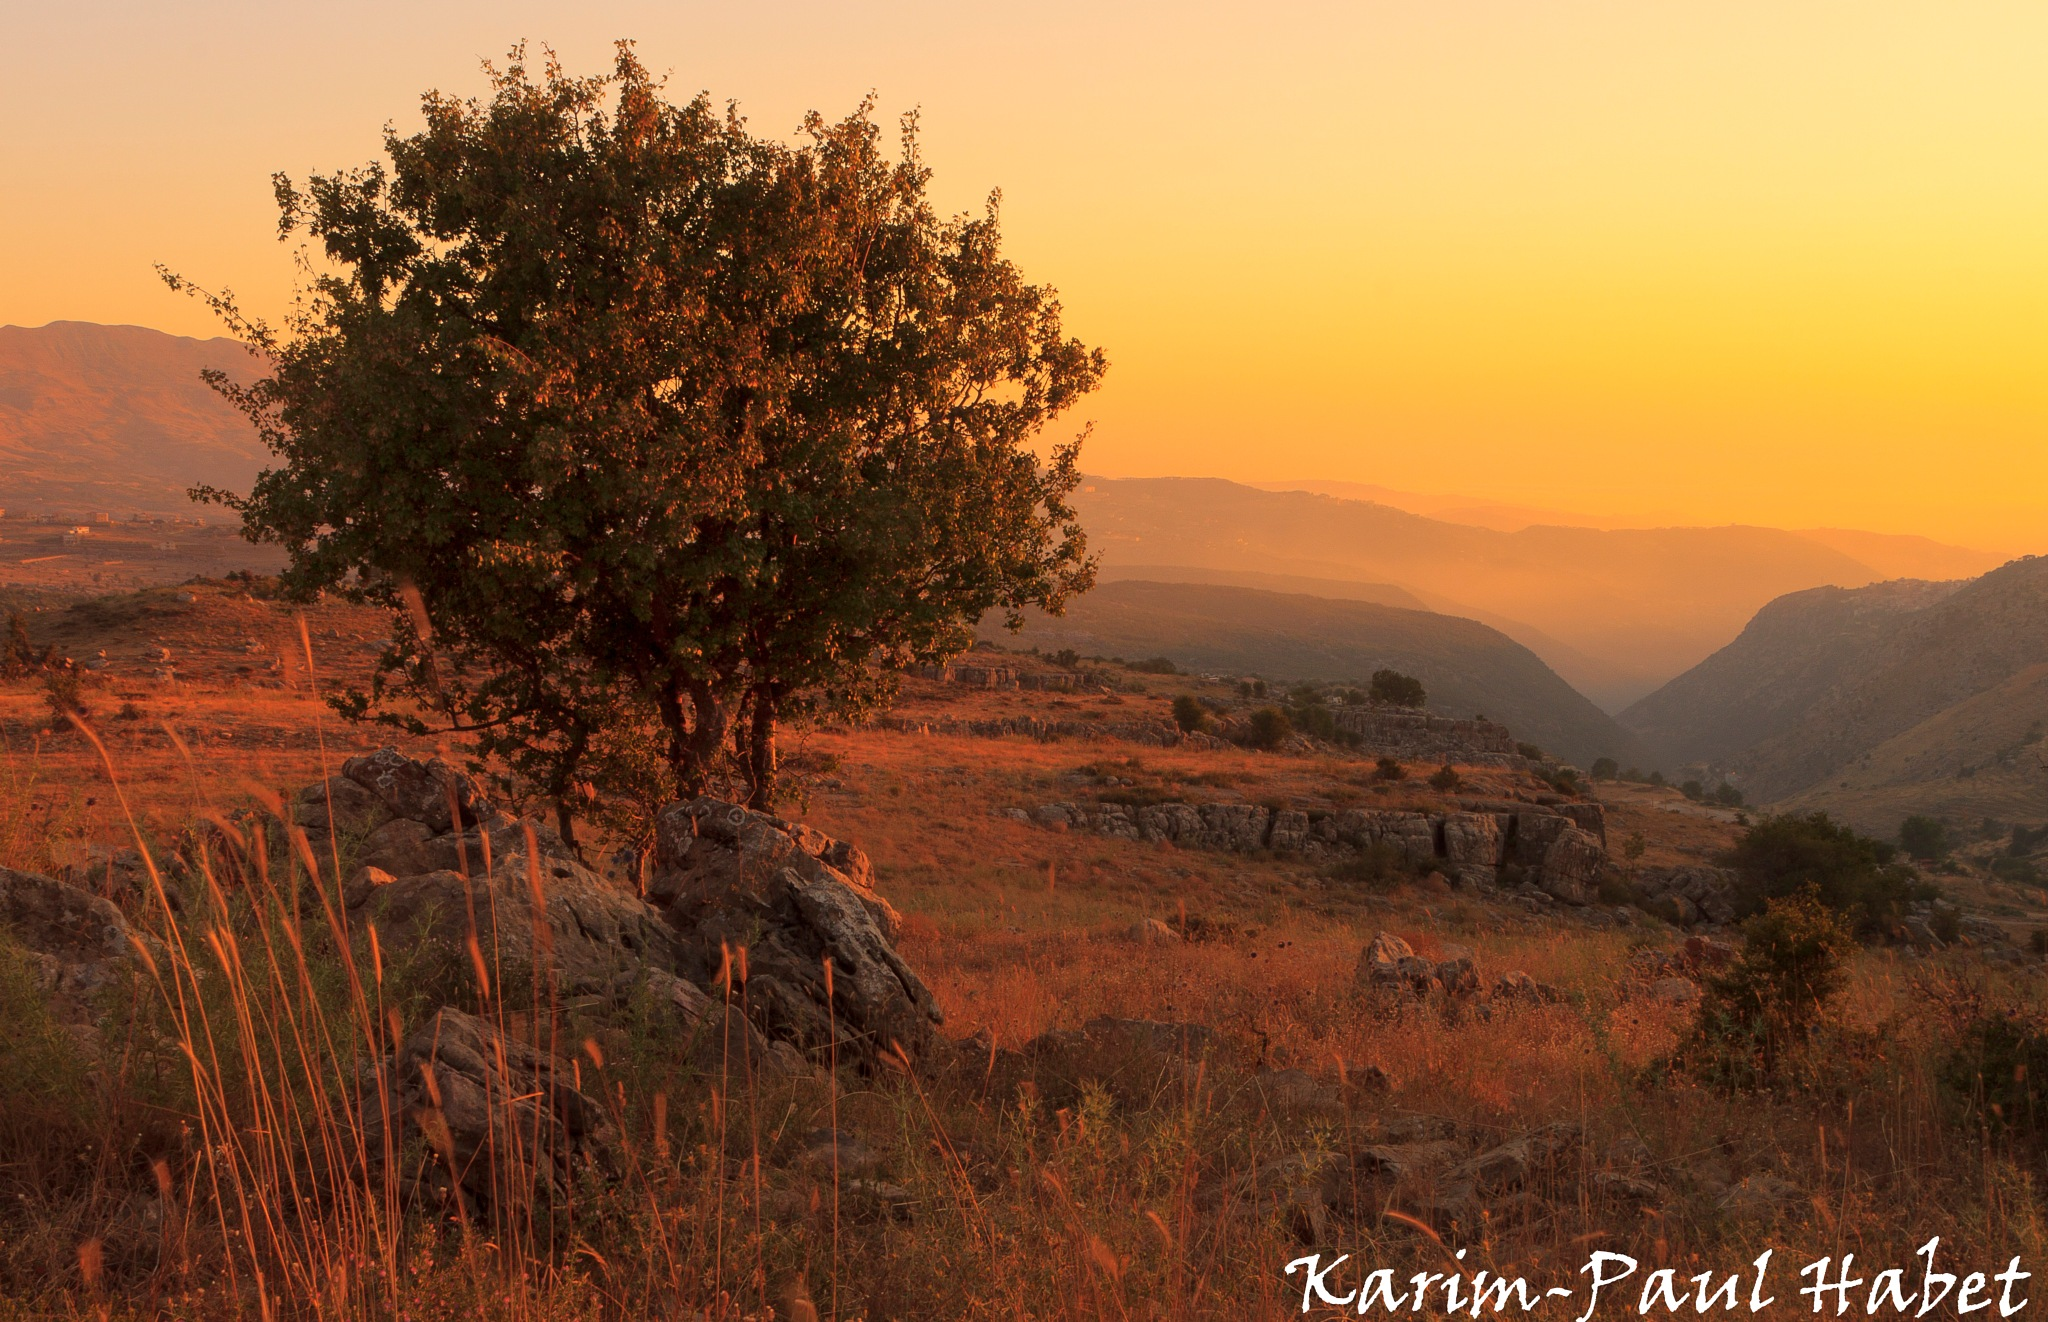 Maple Tree in a Warm afternoon sunset / Erable au coucher du soleil by Karim-Paul Habet